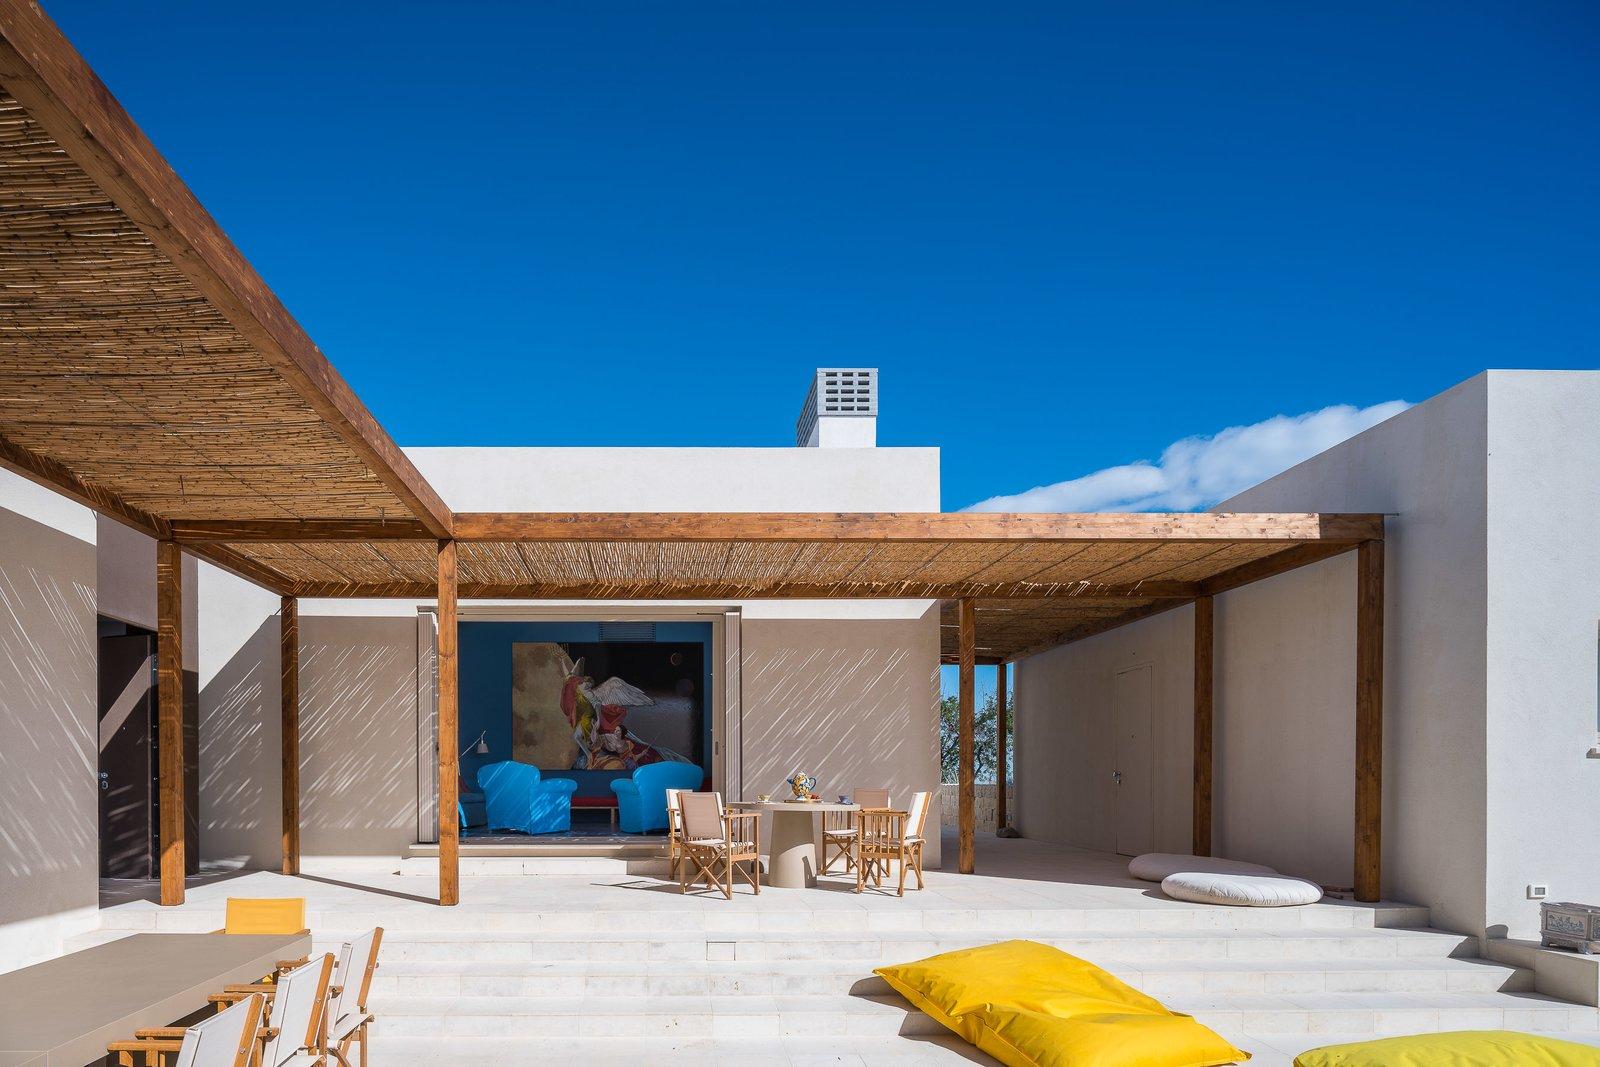 Outdoor, Front Yard, Stone Patio, Porch, Deck, and Large Patio, Porch, Deck  Cozzo Coniglio